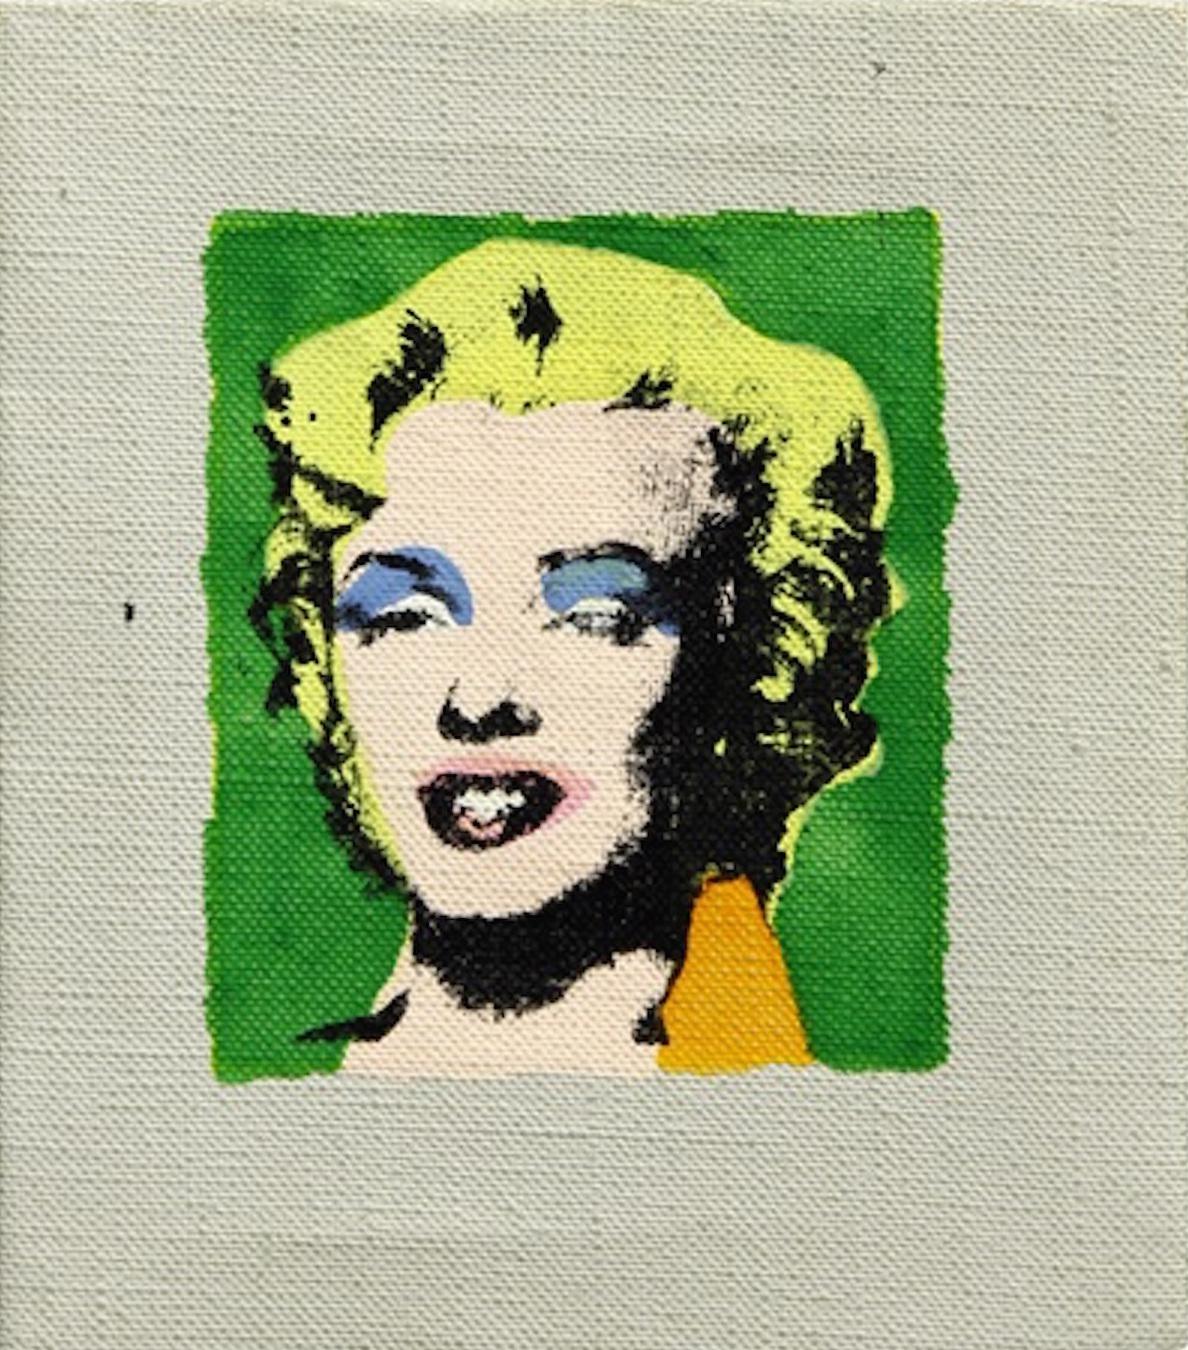 Marilyn on Green Background by Richard Pettibone